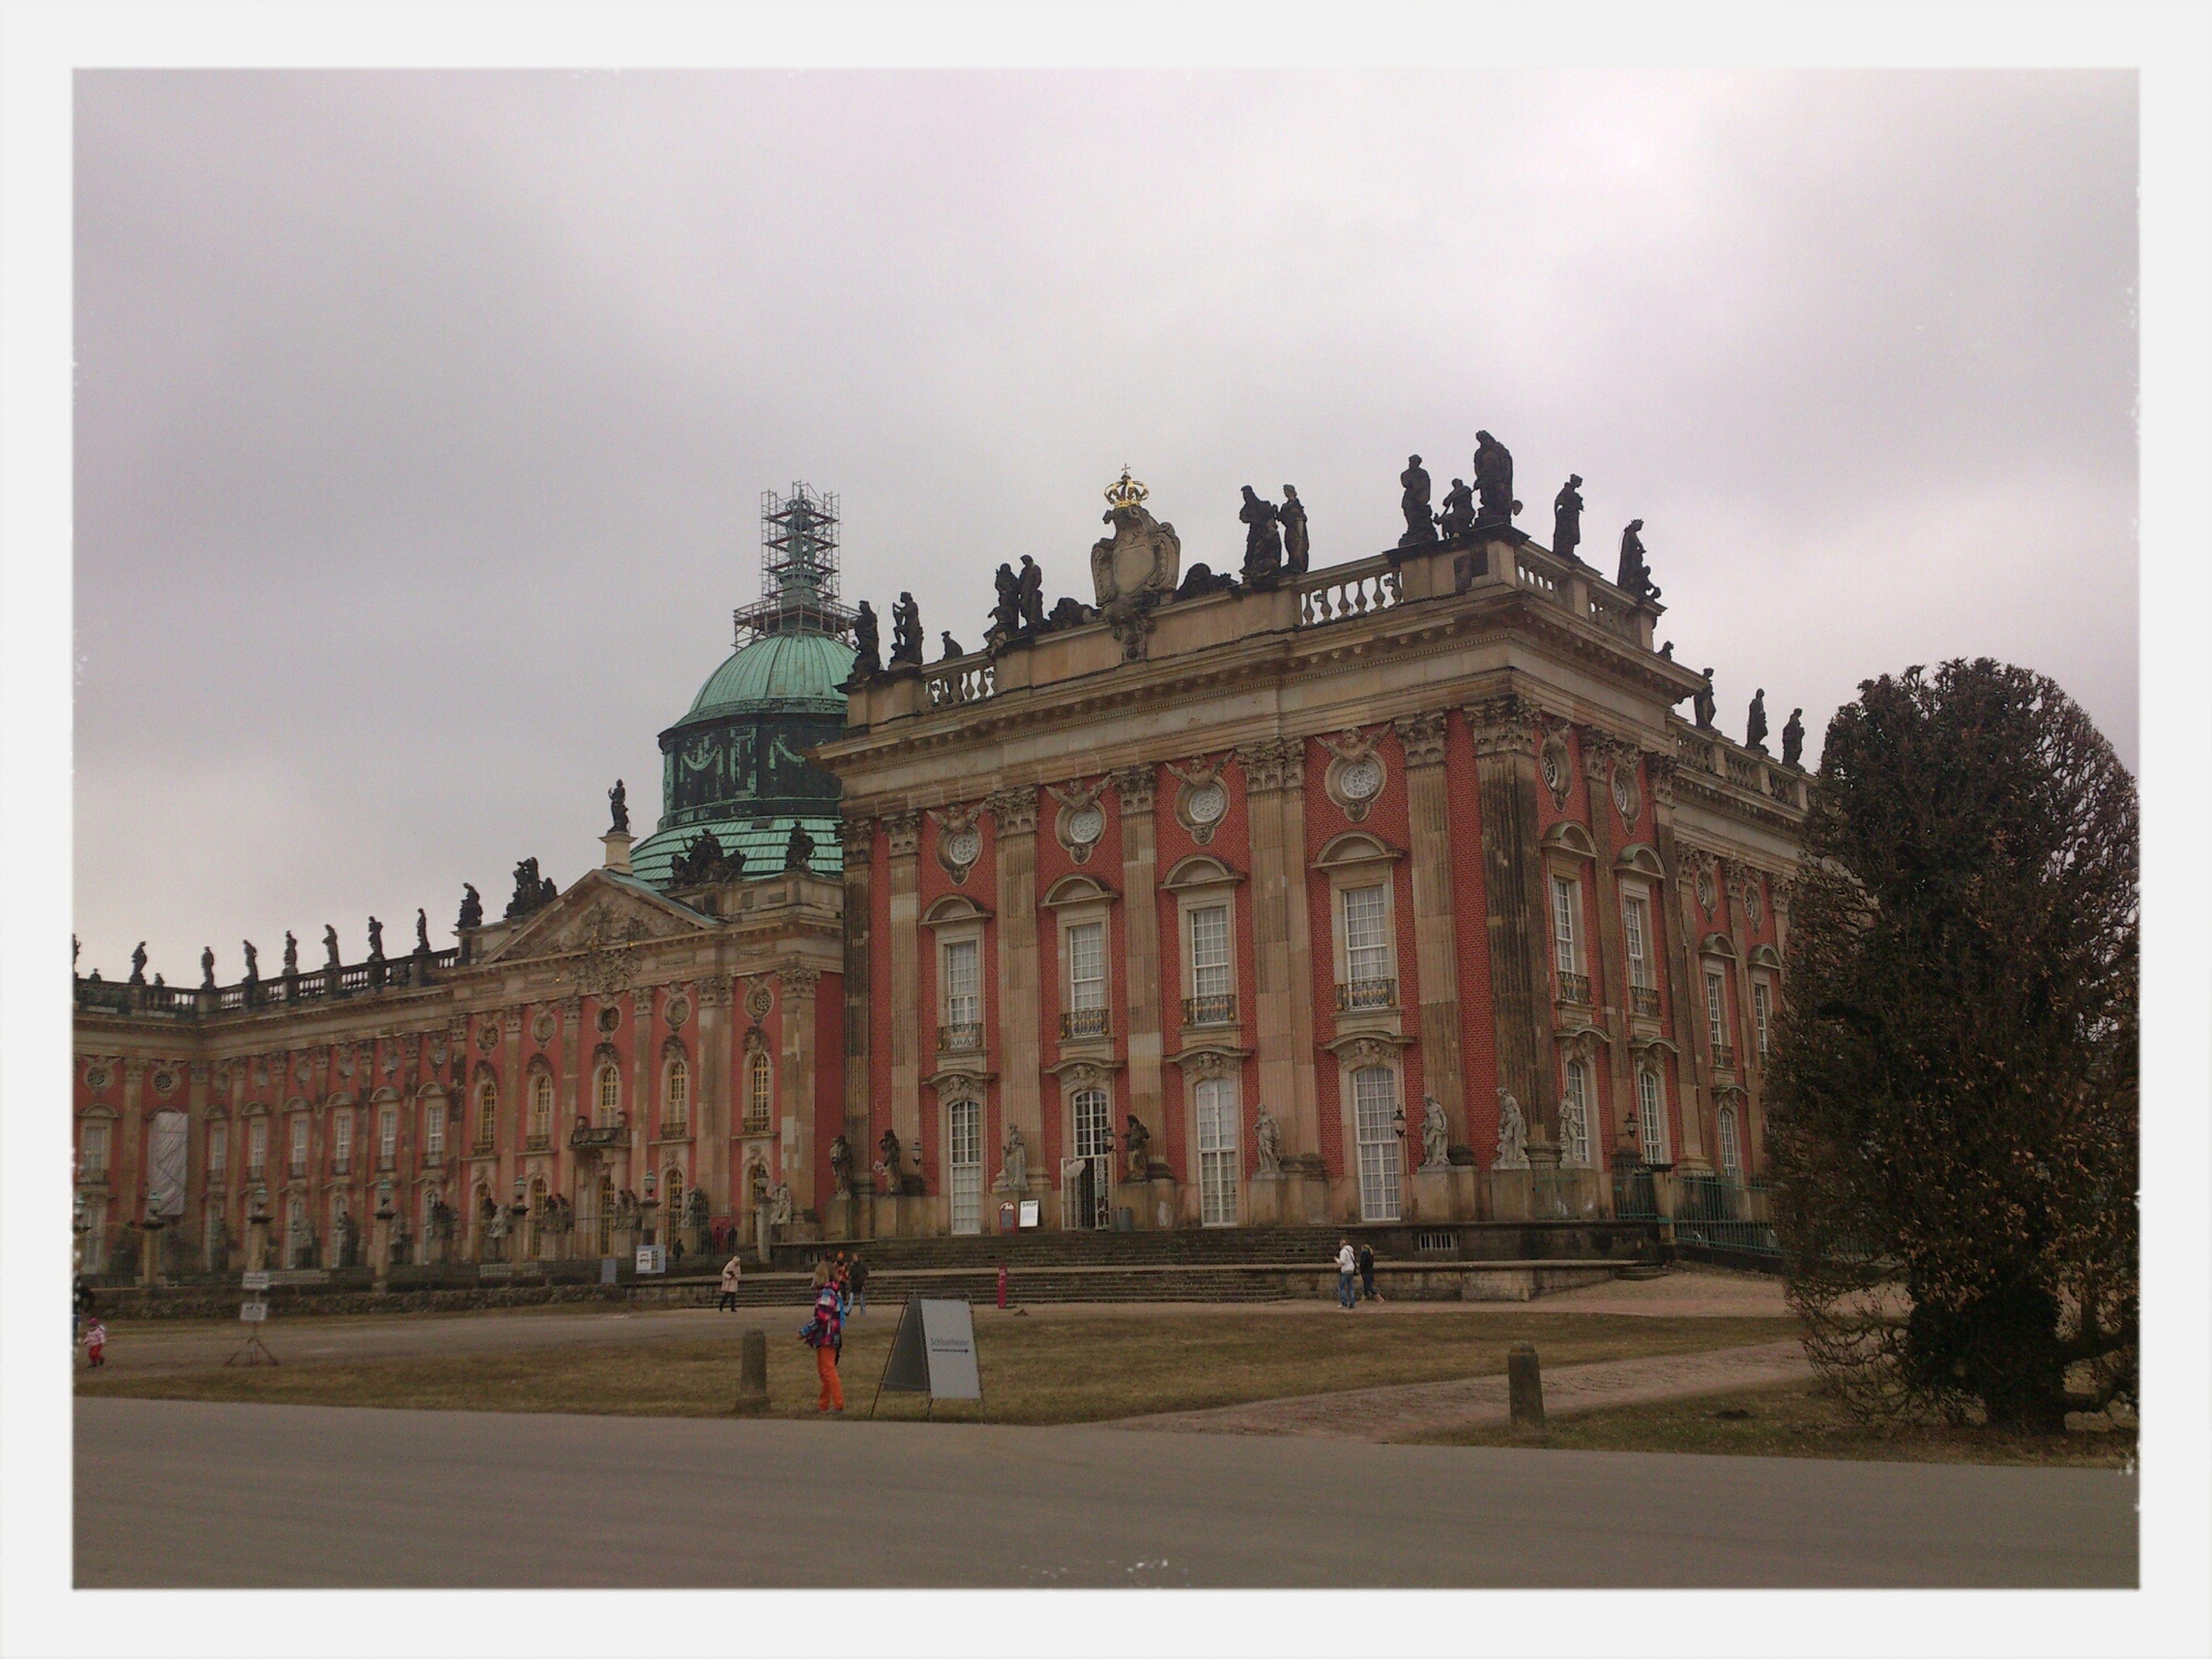 Potsdam University